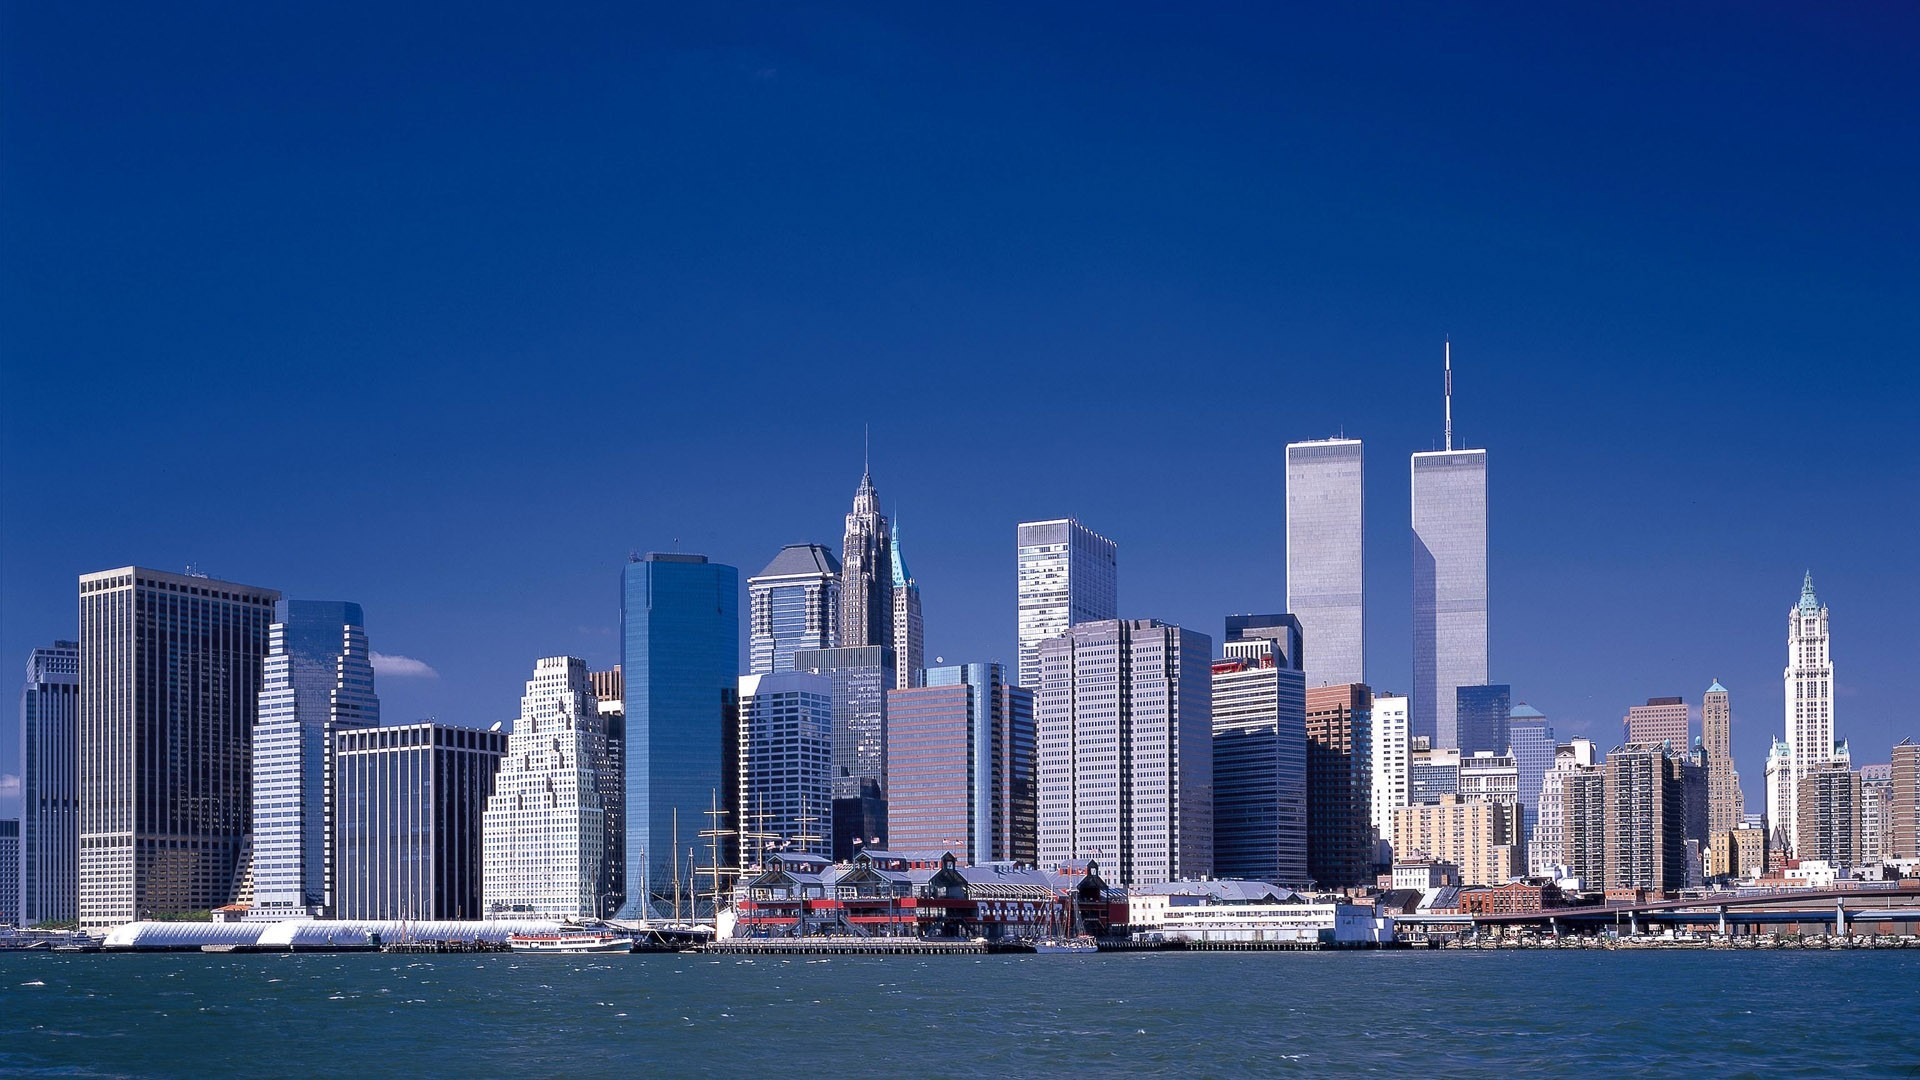 File loc lower manhattan new york city world trade center august 2001 .